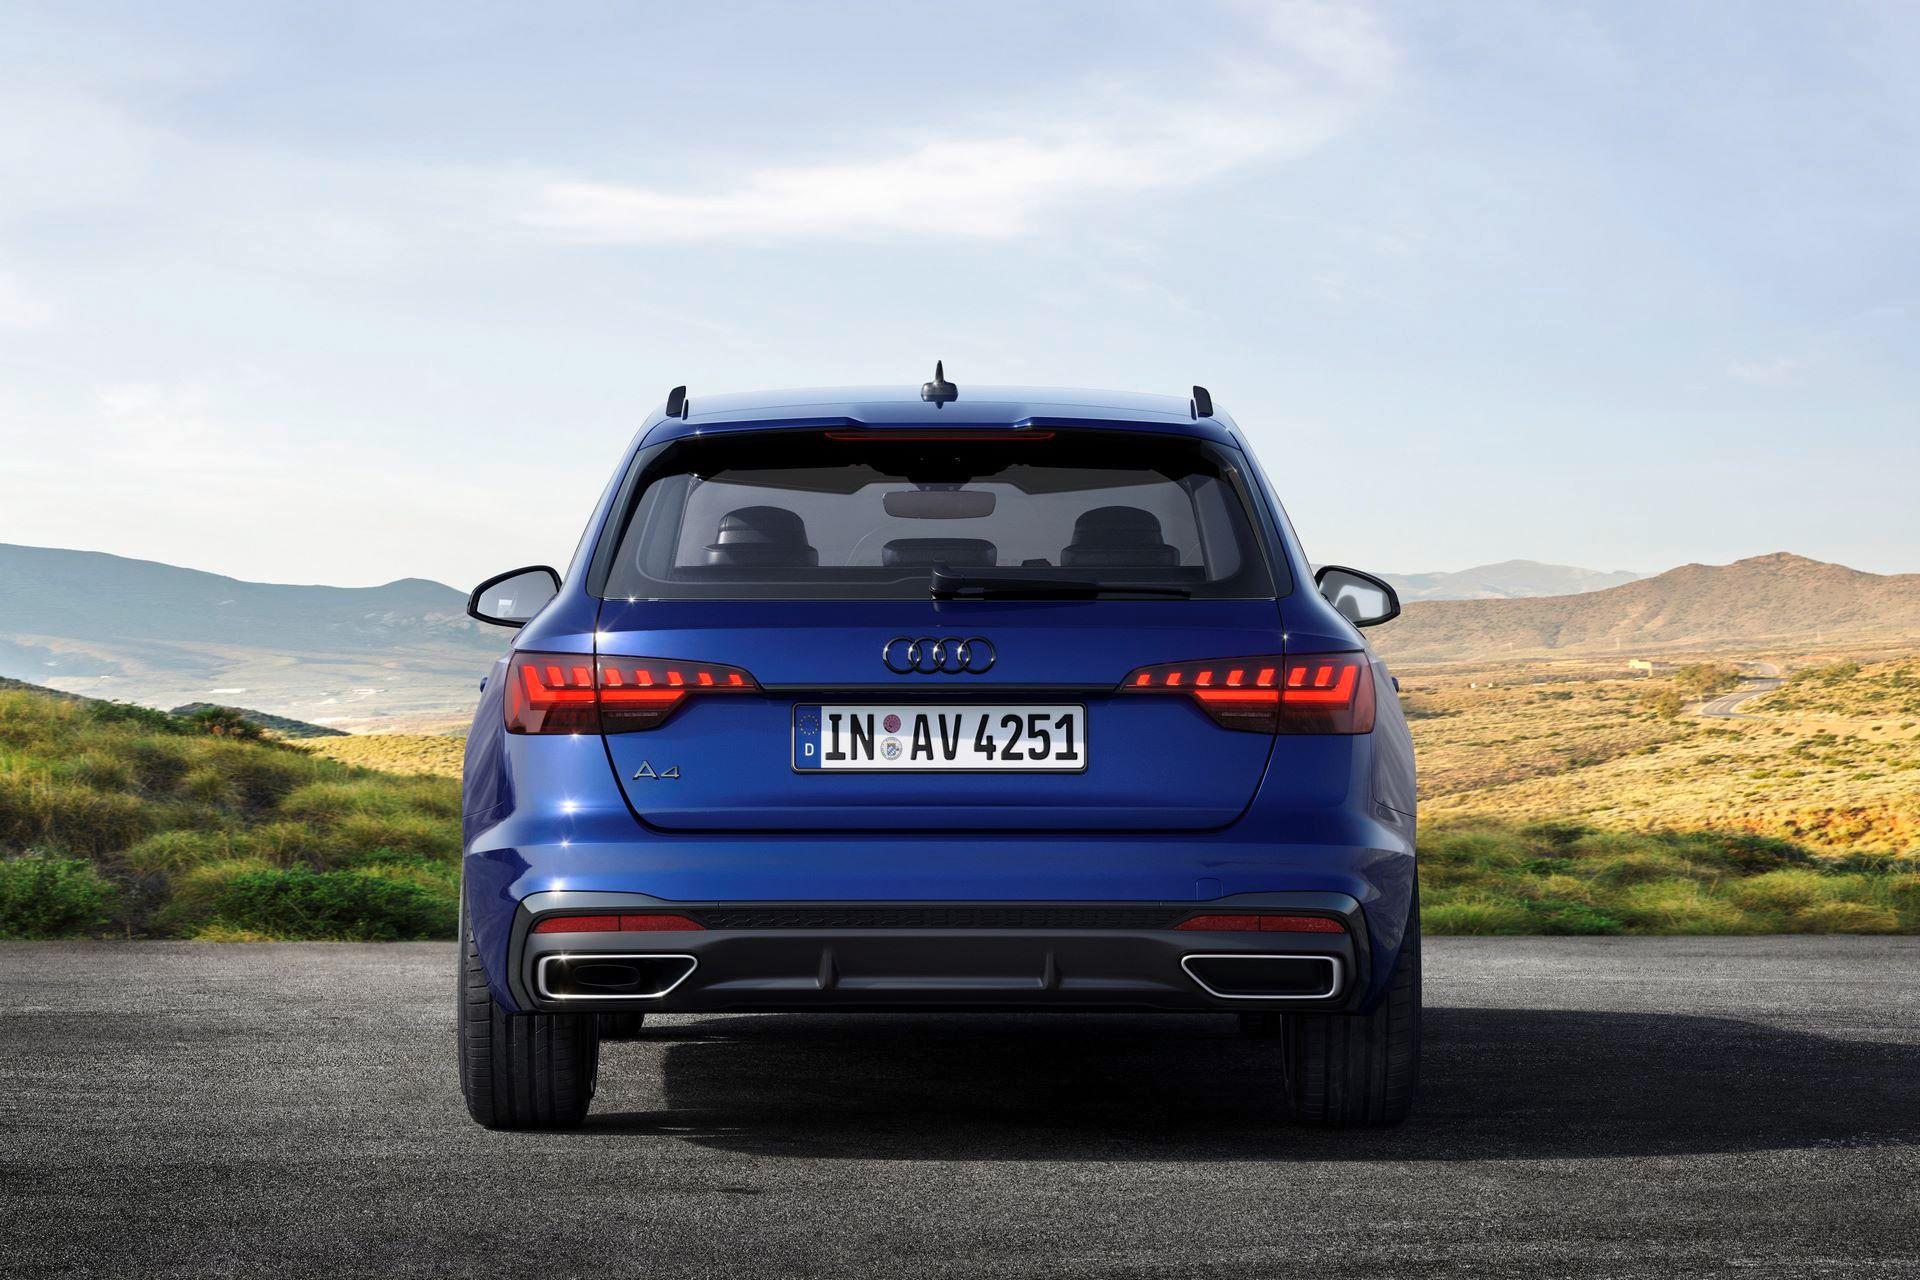 Audi-A4-A5-Q7-Q8-Competition-And-Competition-Plus-Trims-49